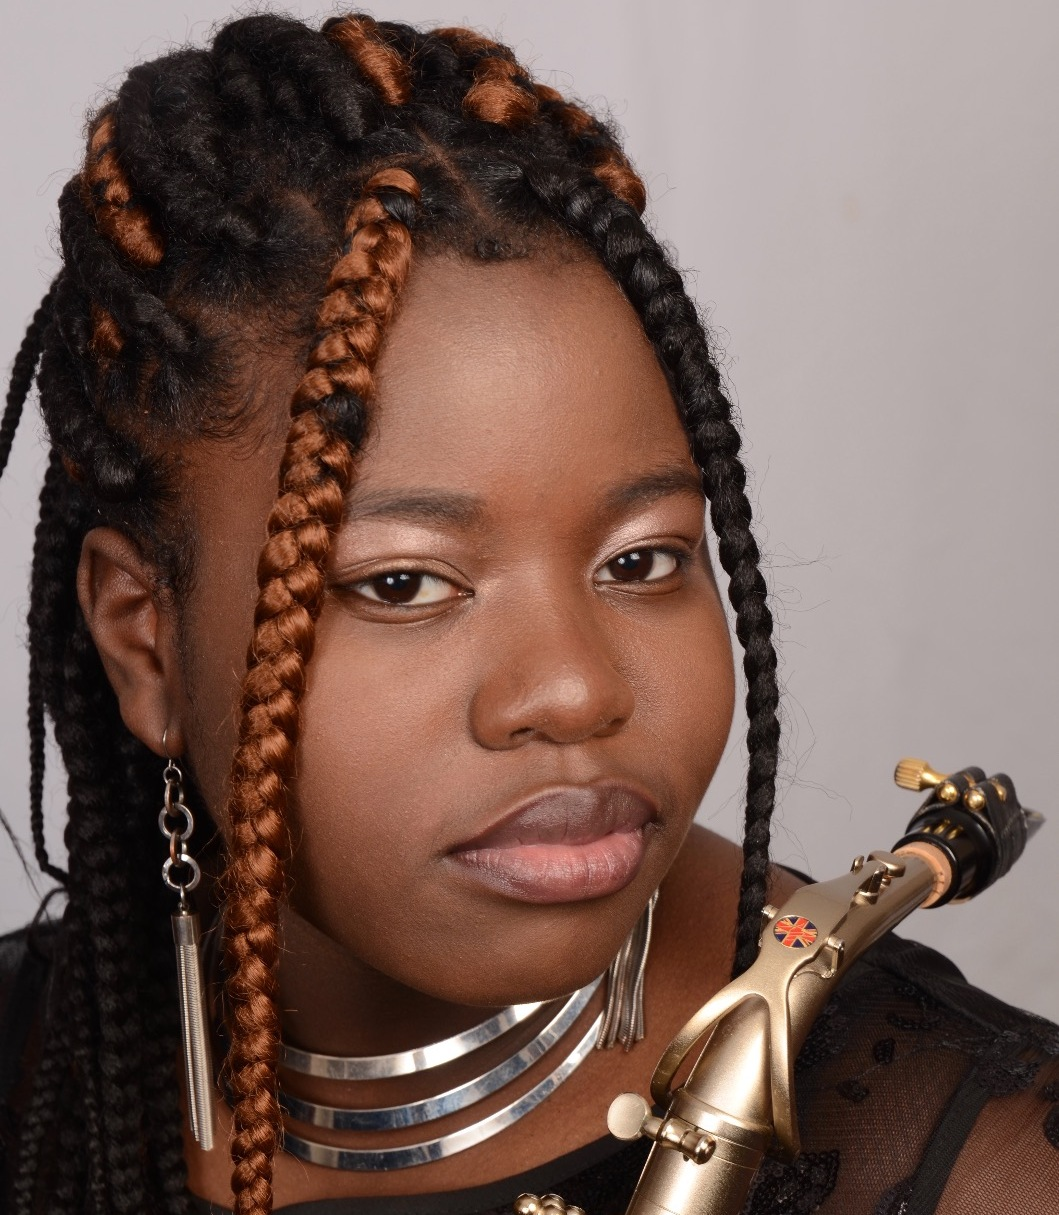 Alice Joshua Female Saxophonist